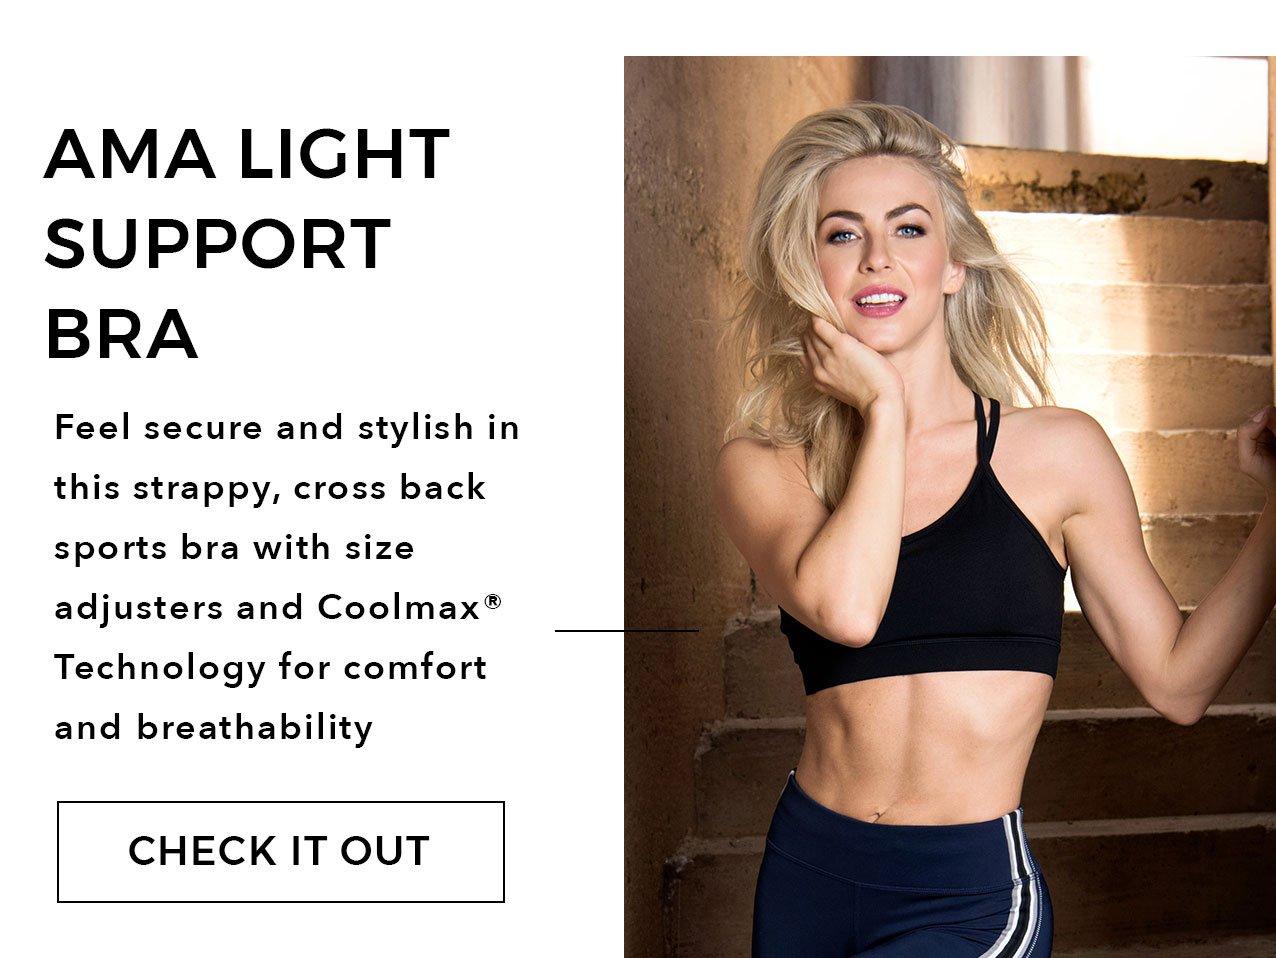 4c22fd5c1cdb9 Ama Light Support Bra - stylish strappy cross back sports bra with size  adjusters.